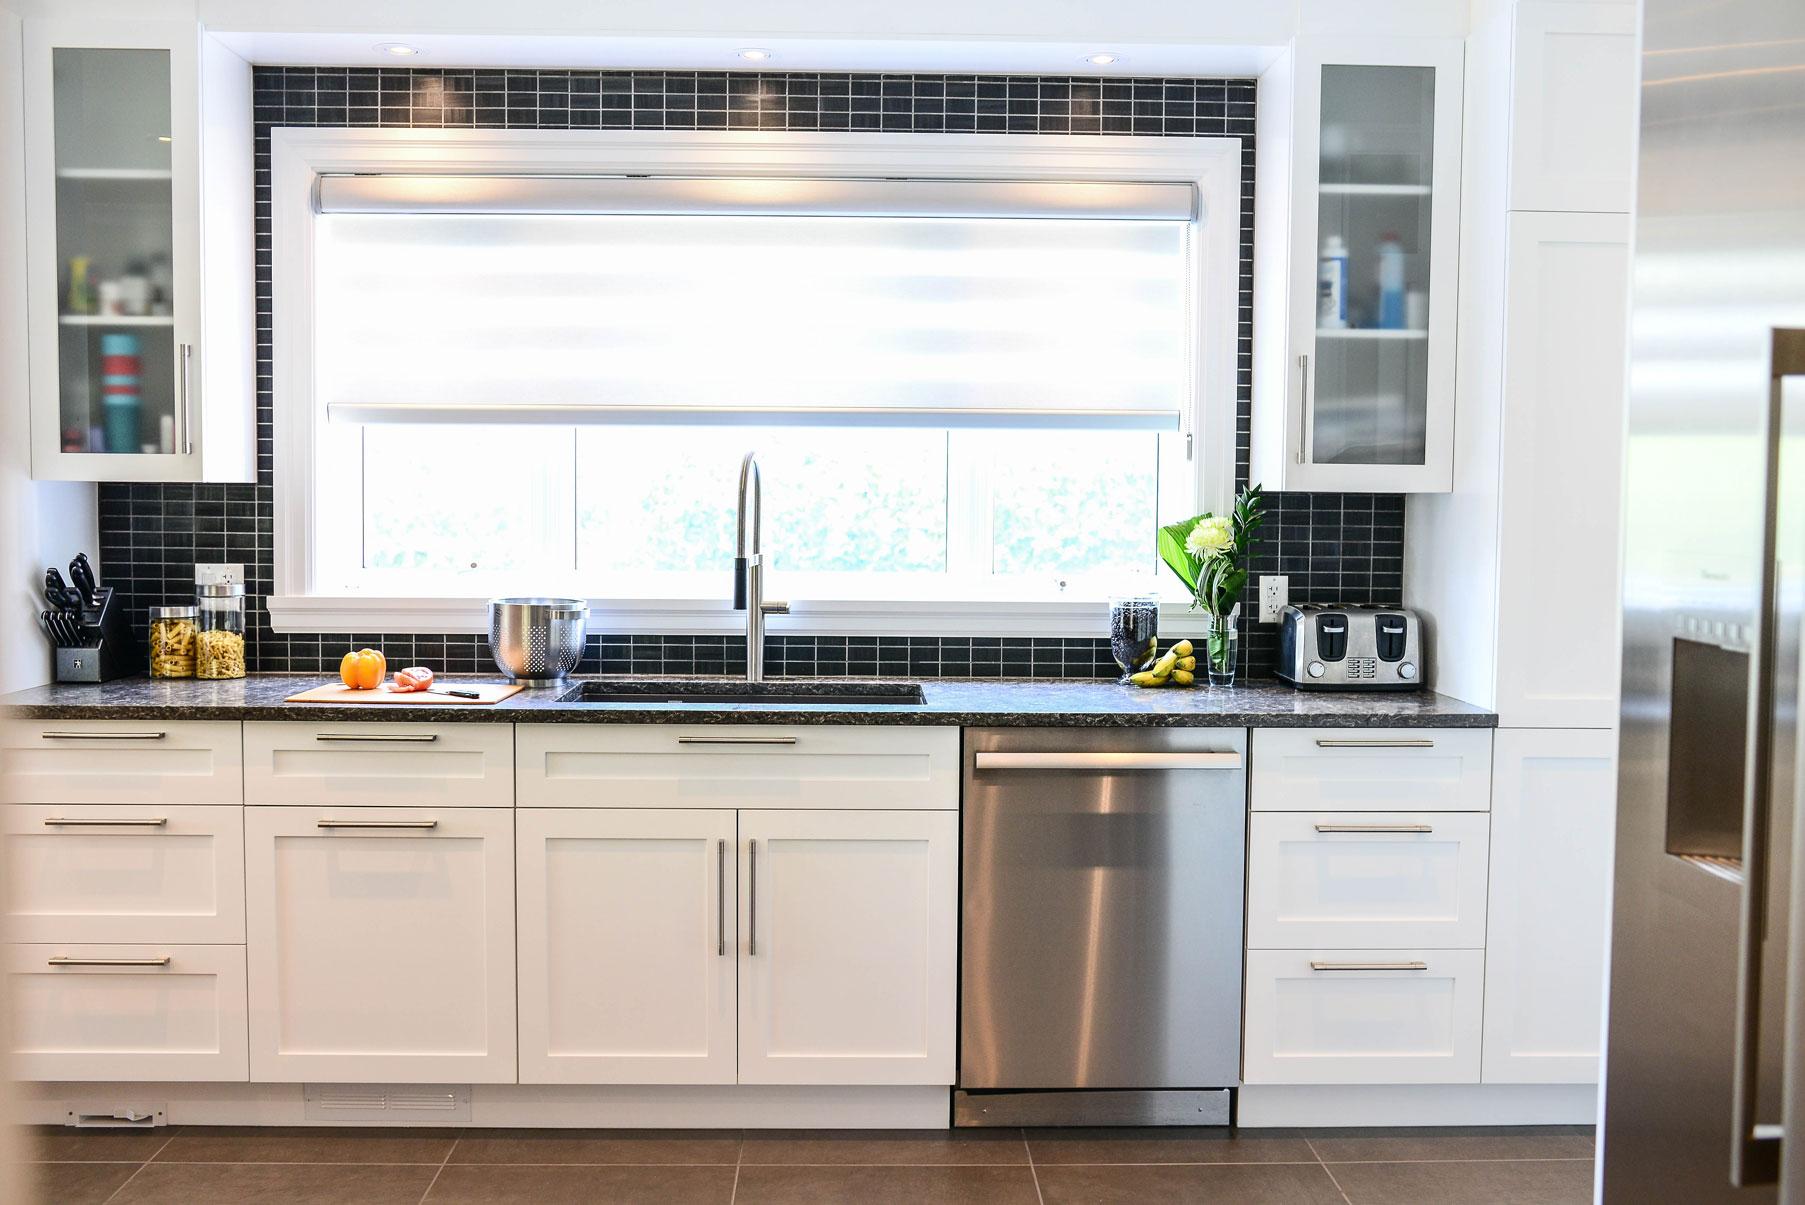 homewise-innovations-sylvio-kitchen-renovation-toronto-2